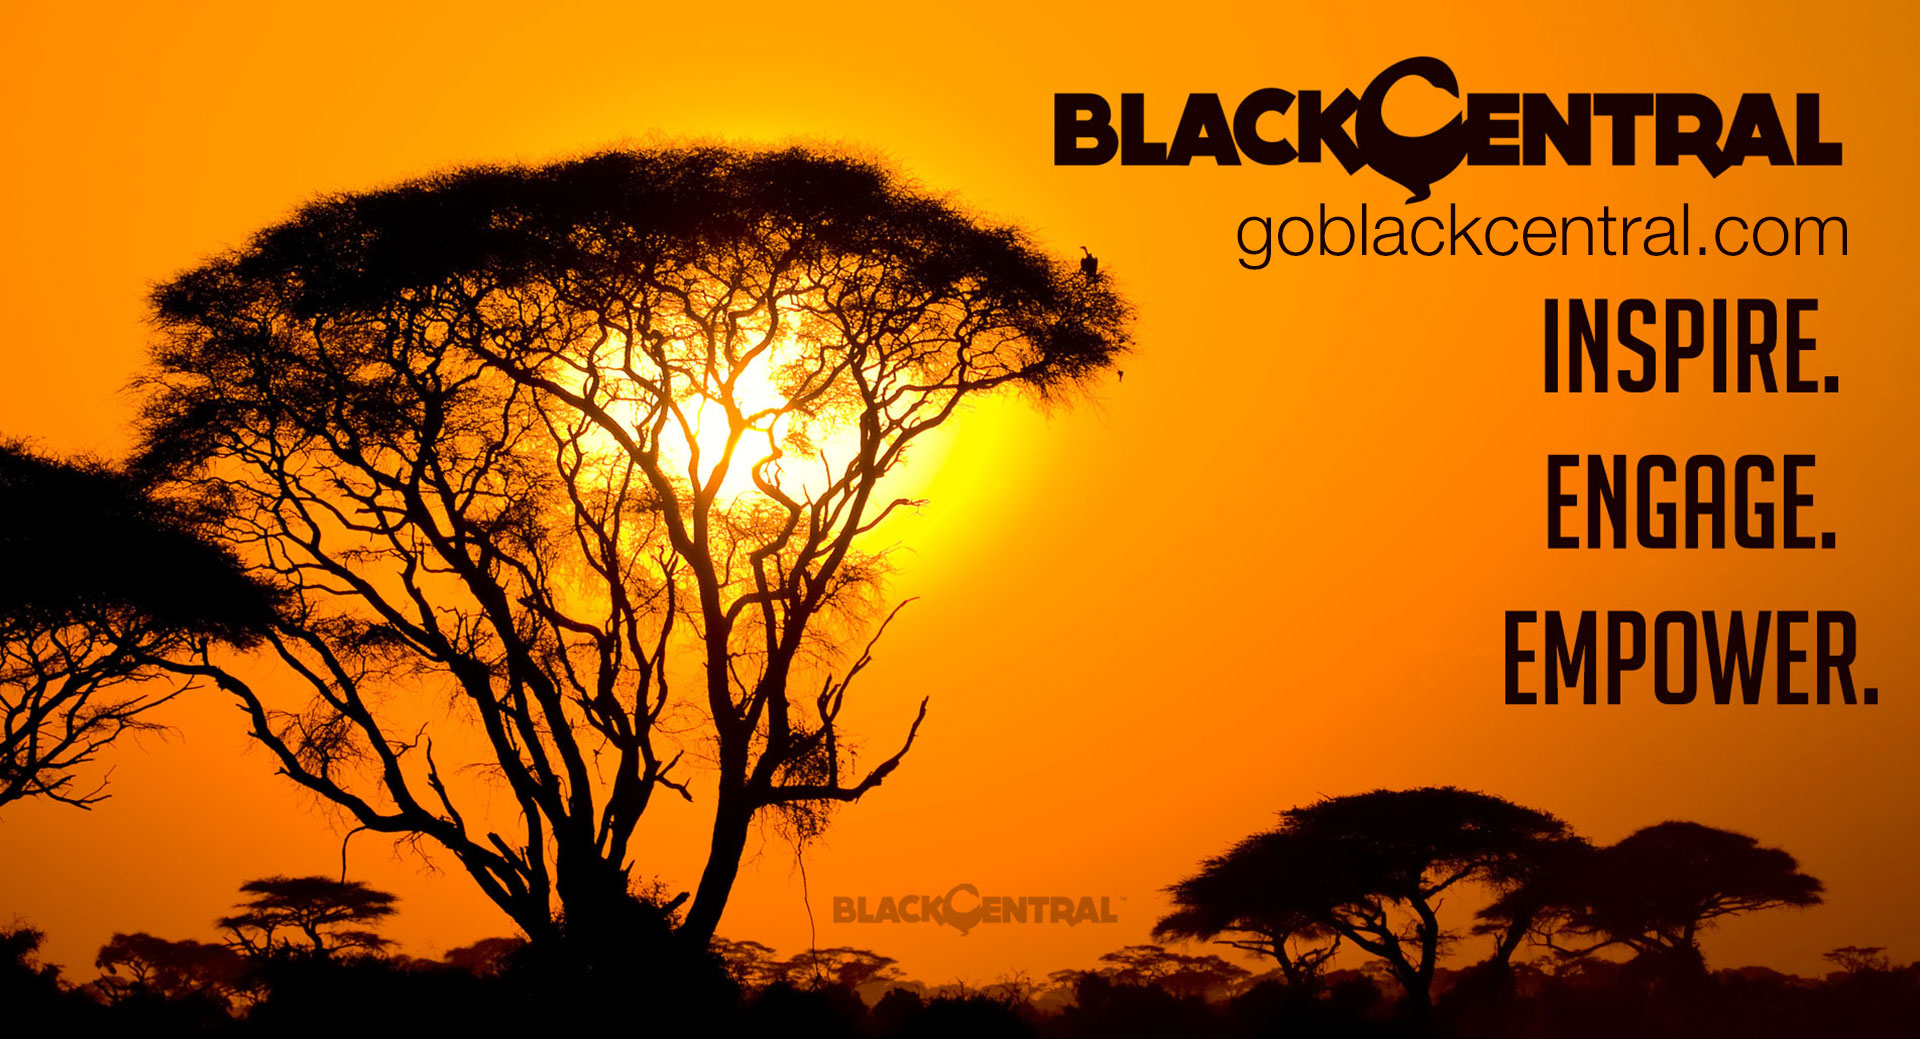 BLACK CENTRAL™